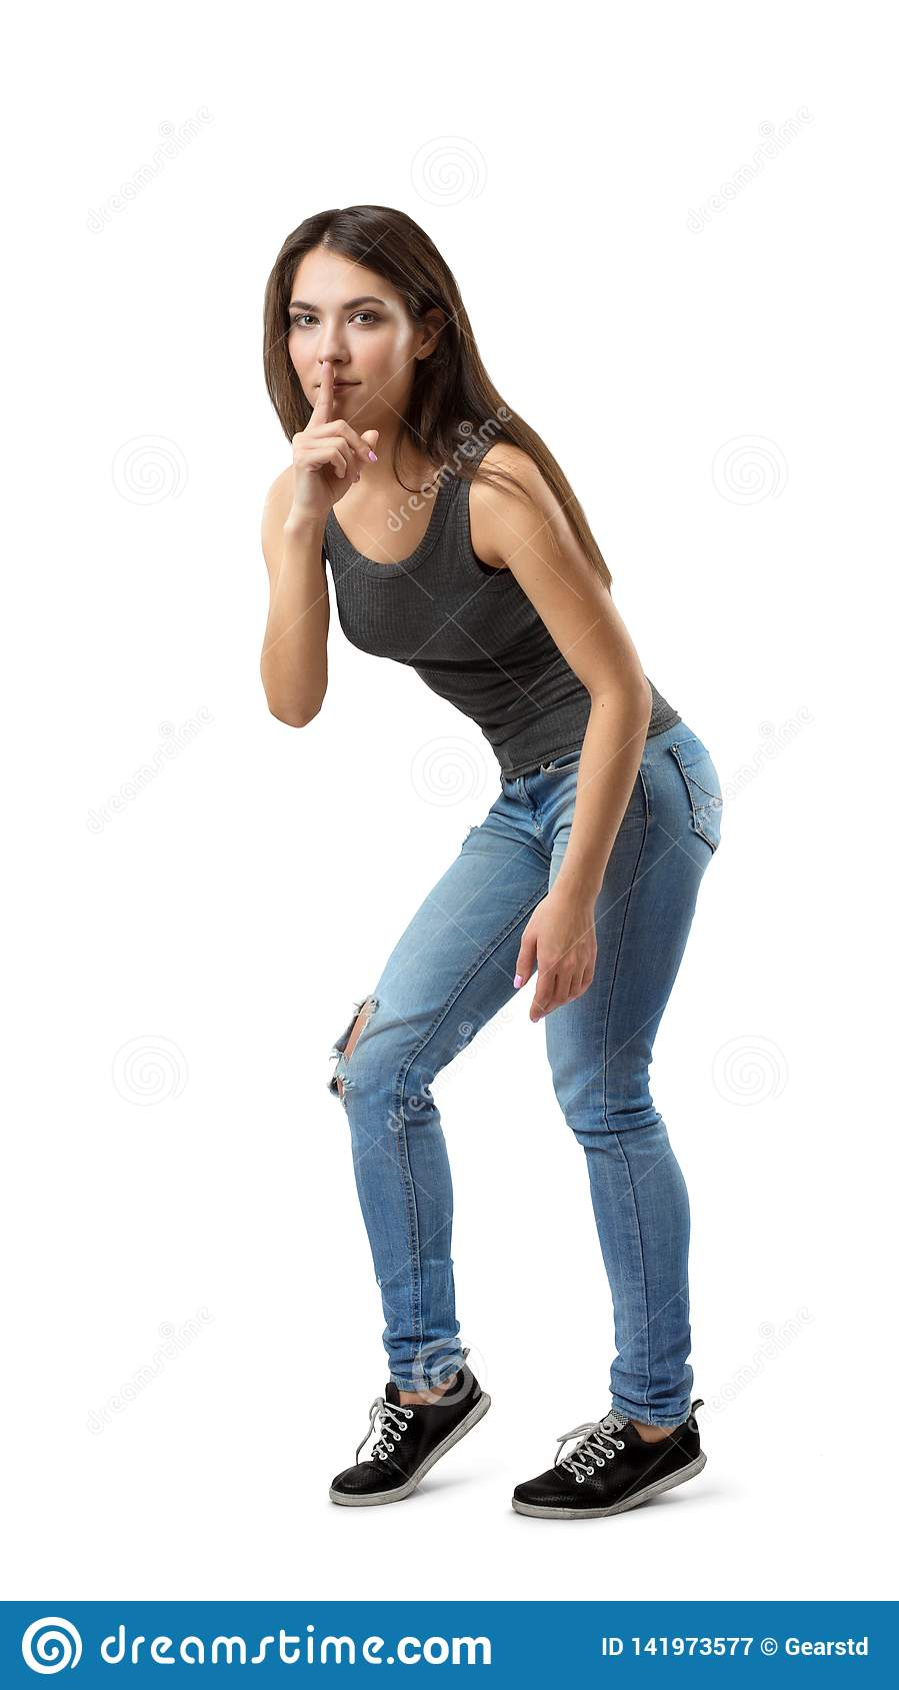 Jong donkerbruin meisje toevallige jeans dragen en t-shirt die stil die gebaar tonen op witte achtergrond wordt geïsoleerd